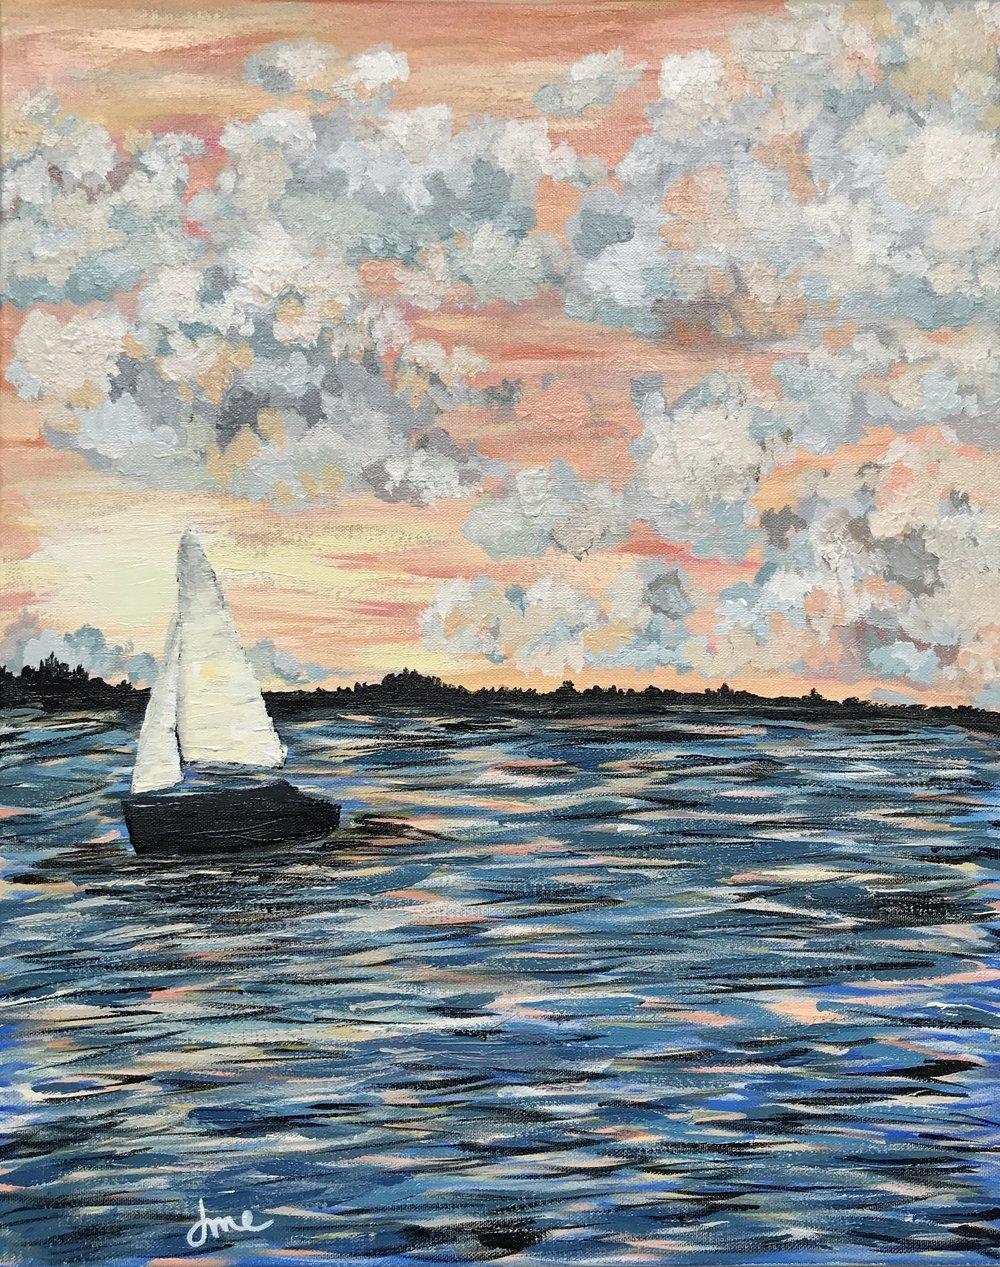 Set sail at sunset - 16